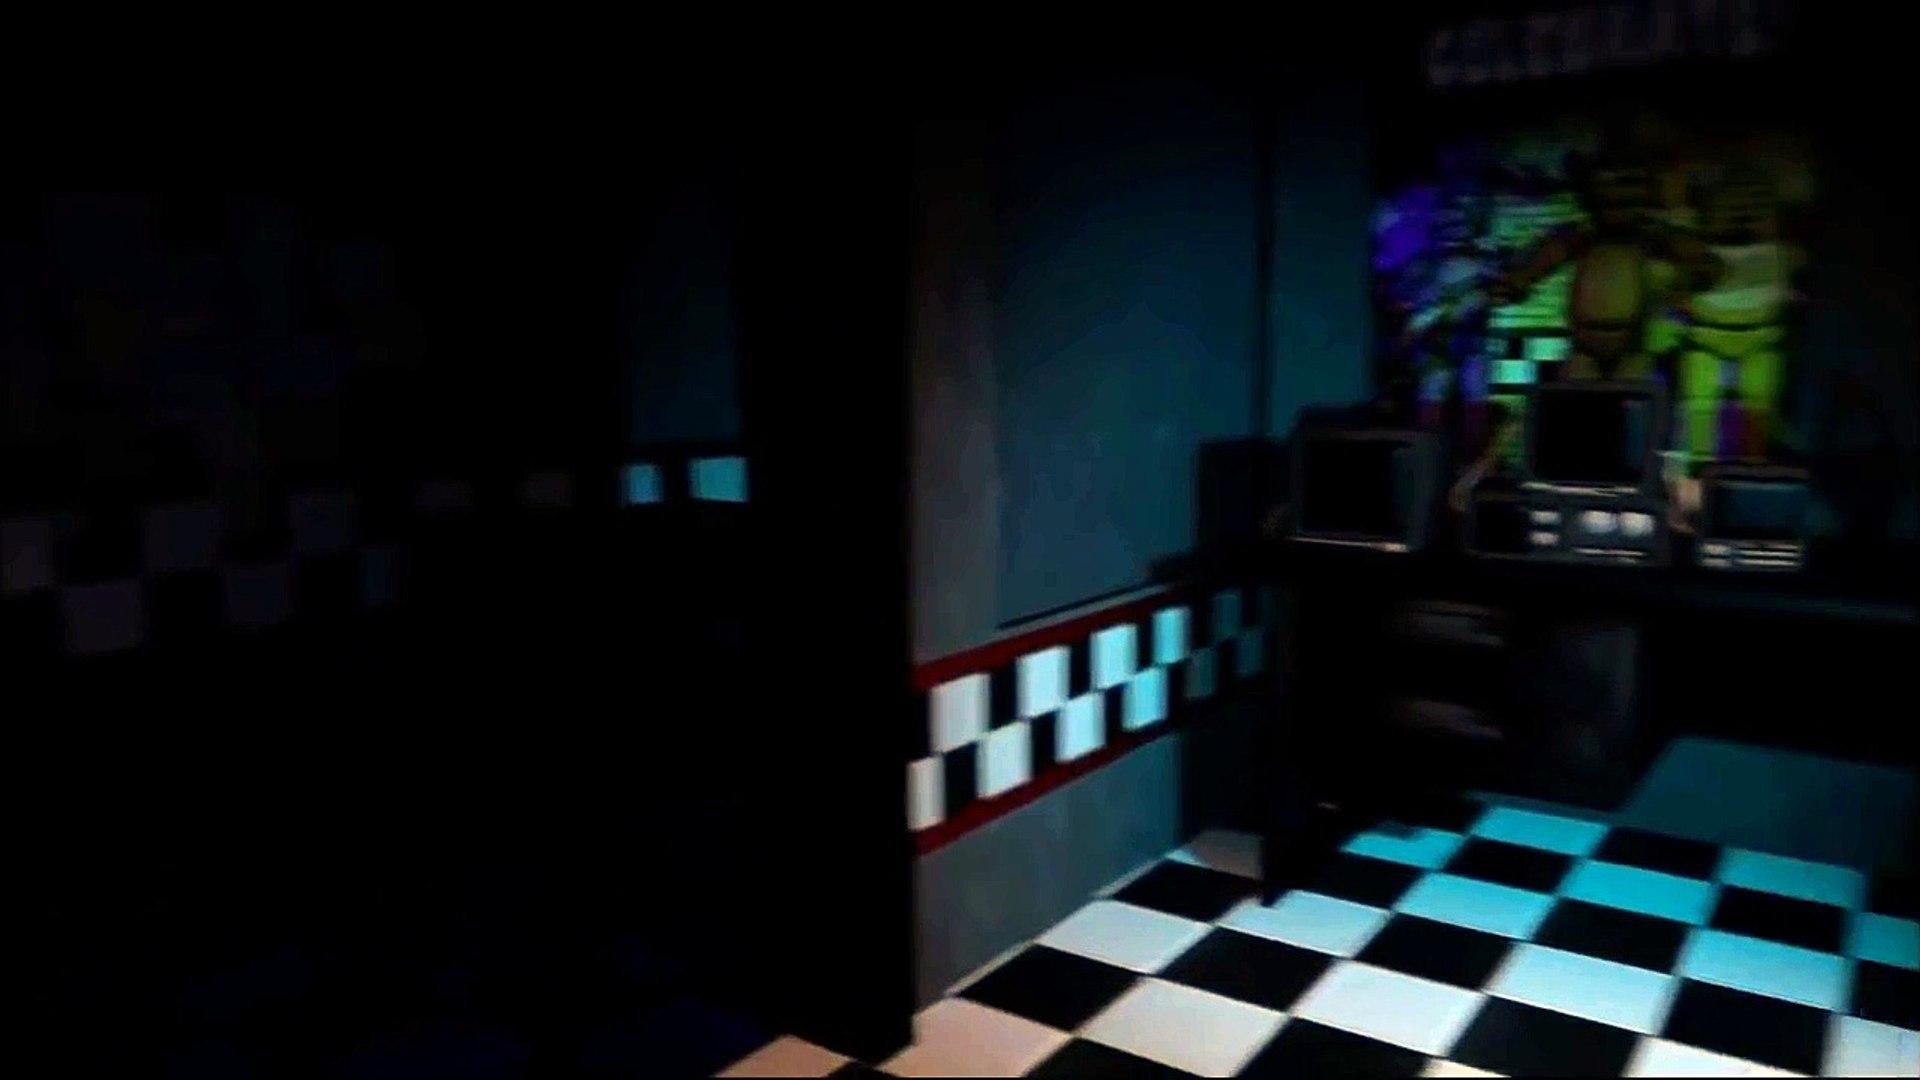 Five Nights at Freddys : SEXY FREDERIKA JUMPSCARE! | FNAF SFM Animation